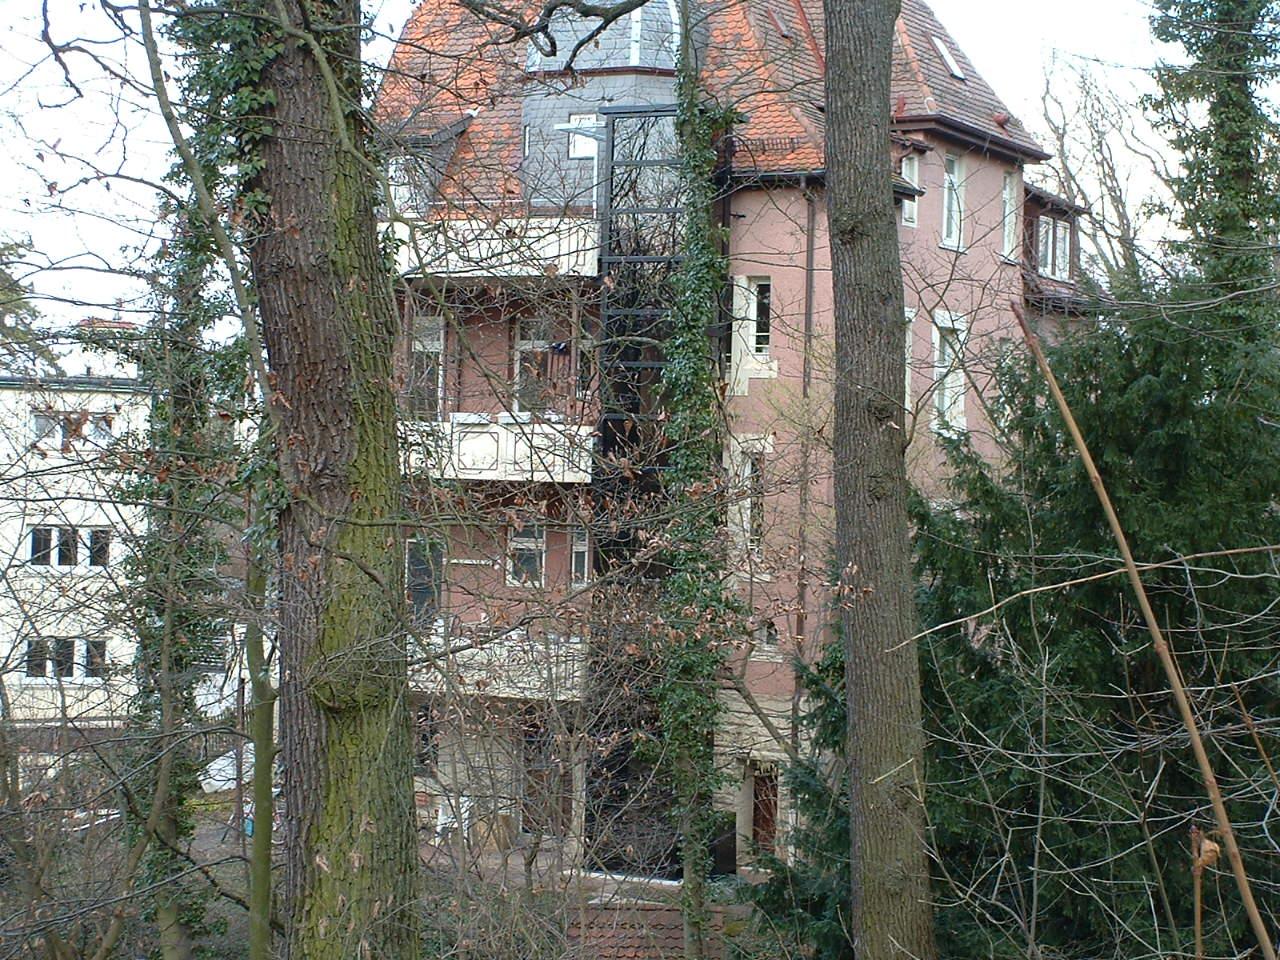 Homelift außen an Altbau neben Balkonen